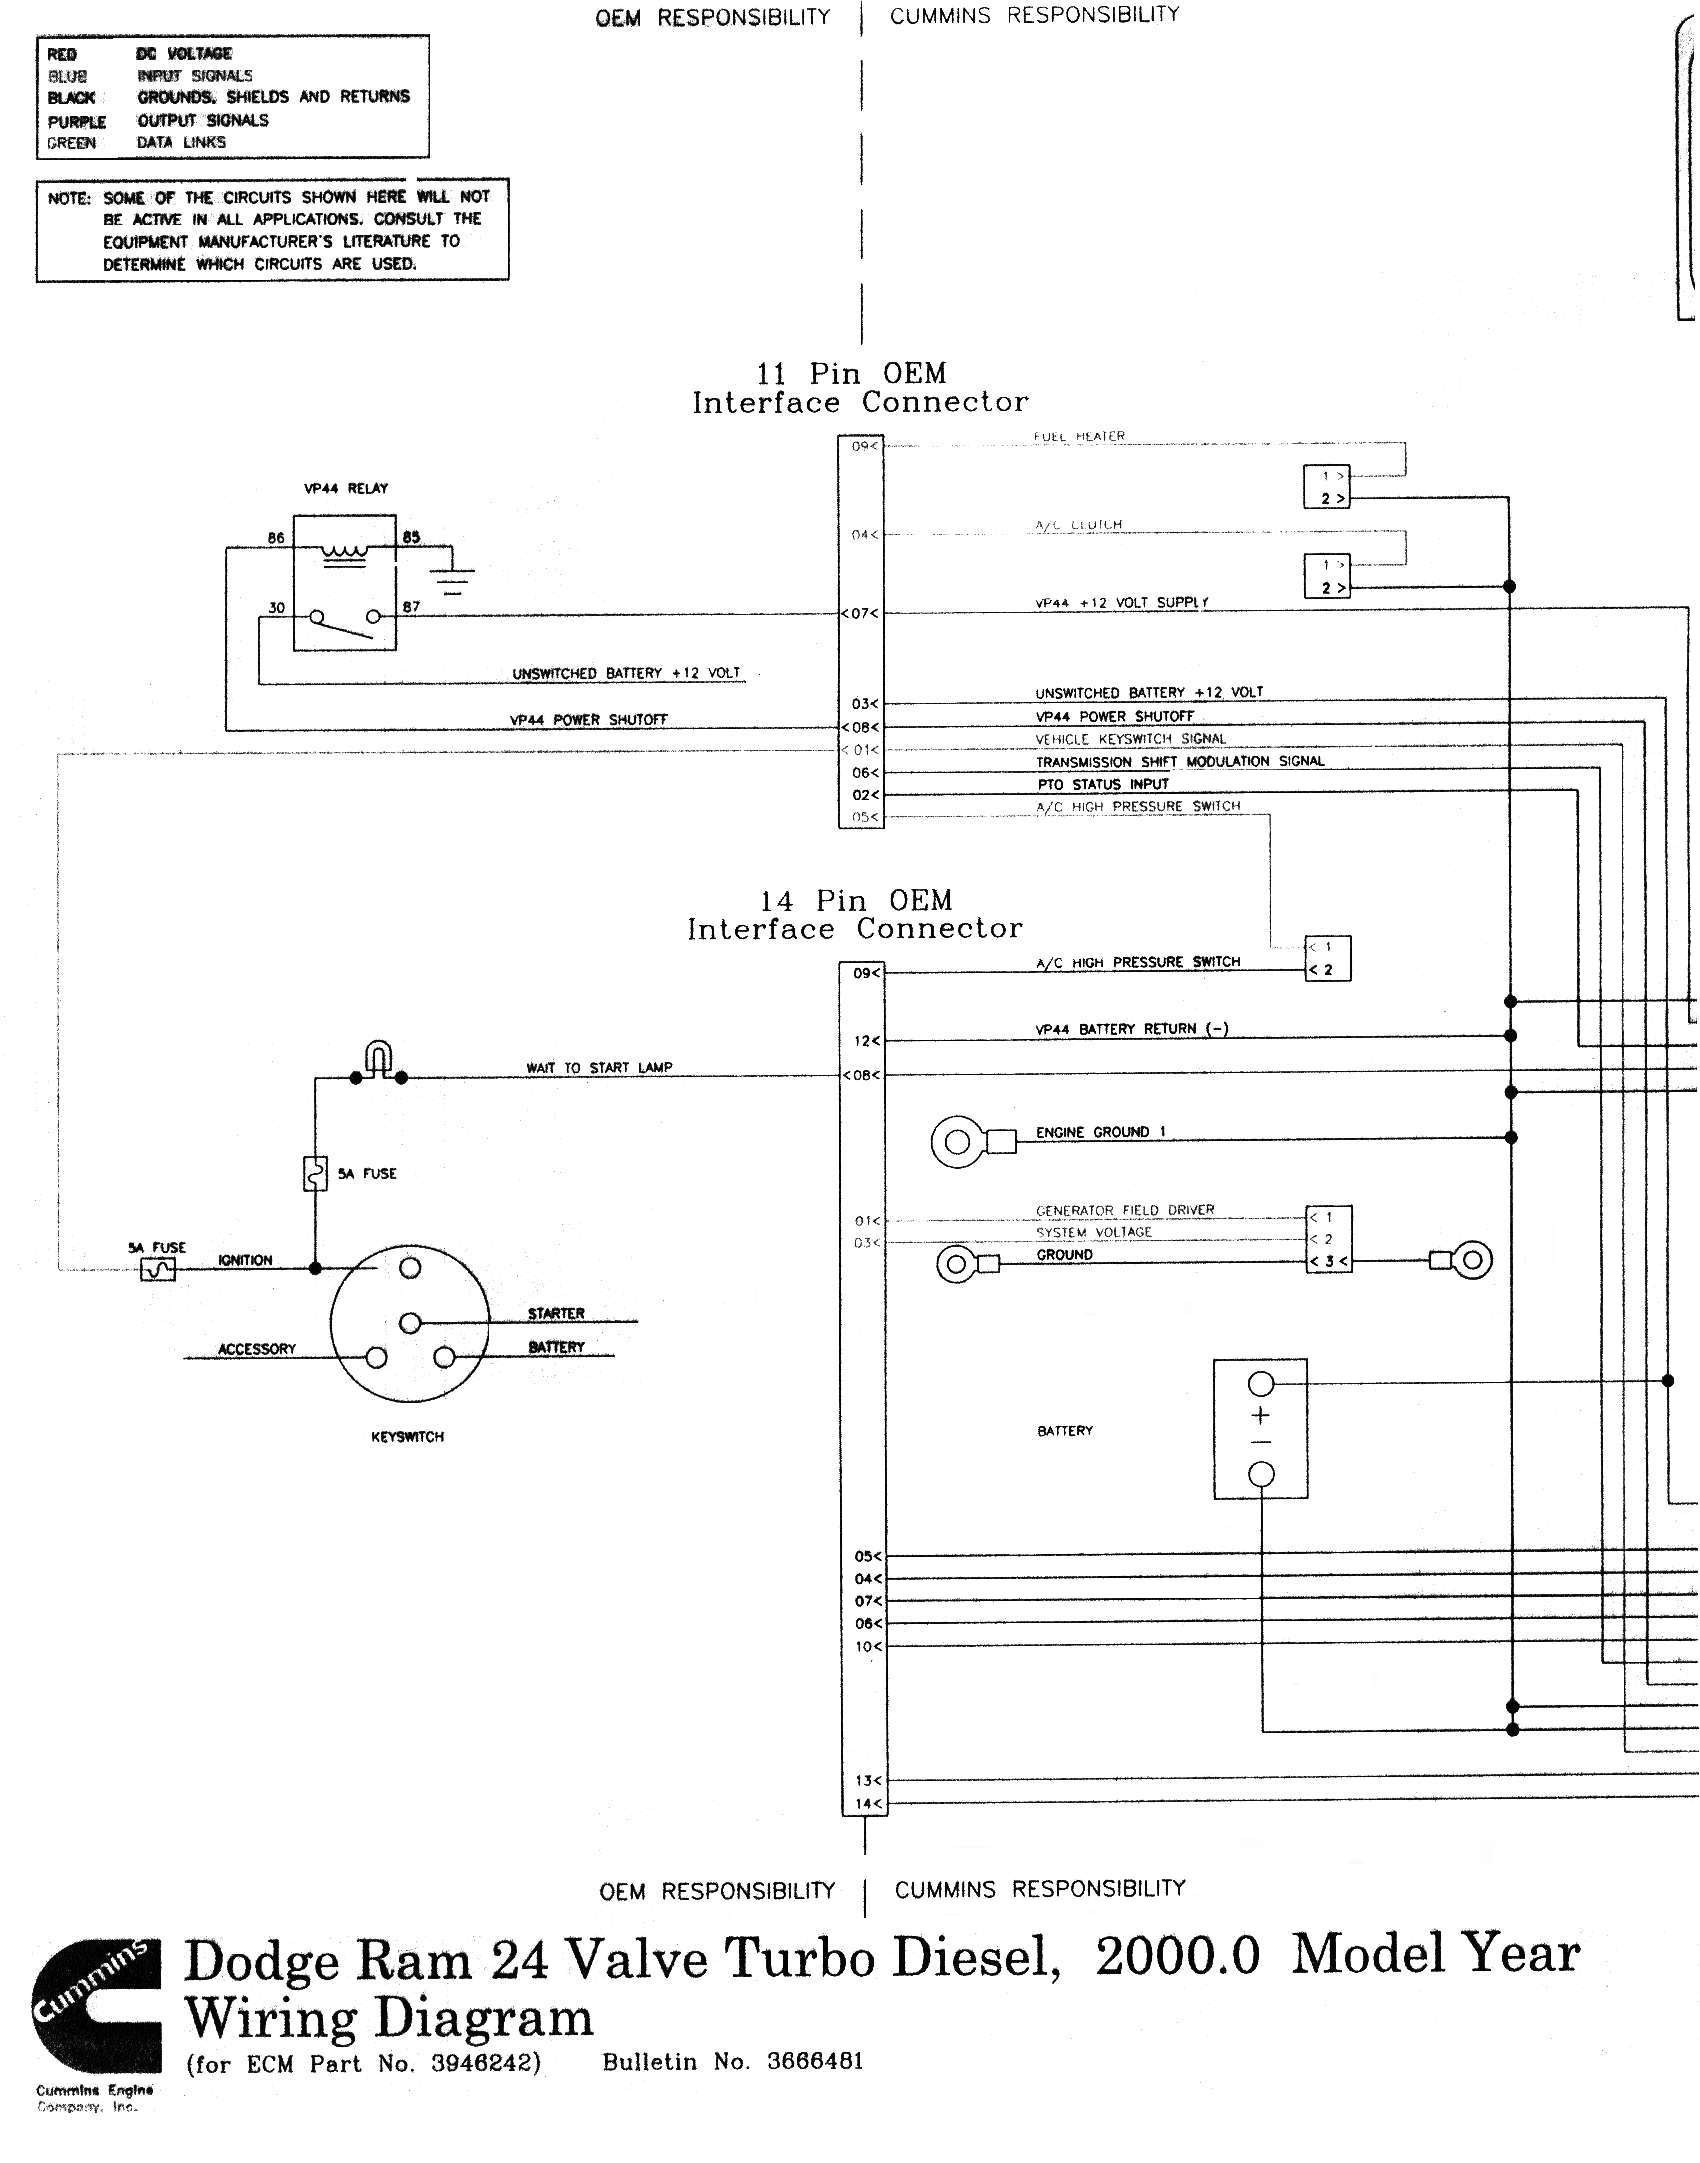 Dodge Ram Parts Diagram Dodge Cummins Diesel Fuel Line Diagram Dodge Obd Connector Wiring Of Dodge Ram Parts Diagram